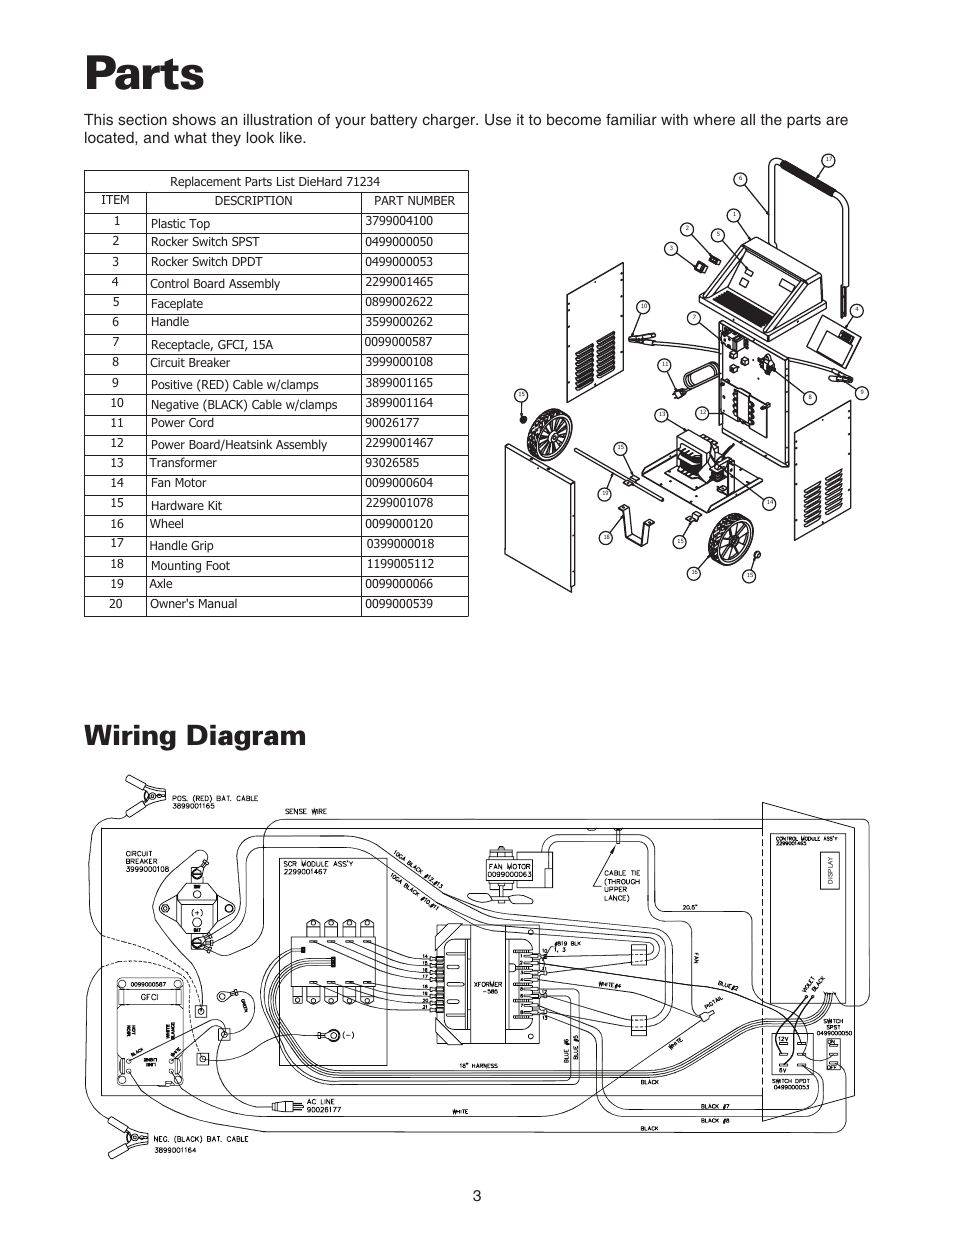 medium resolution of parts wiring diagram sears 200 71234 user manual page 4 15 rh manualsdir com